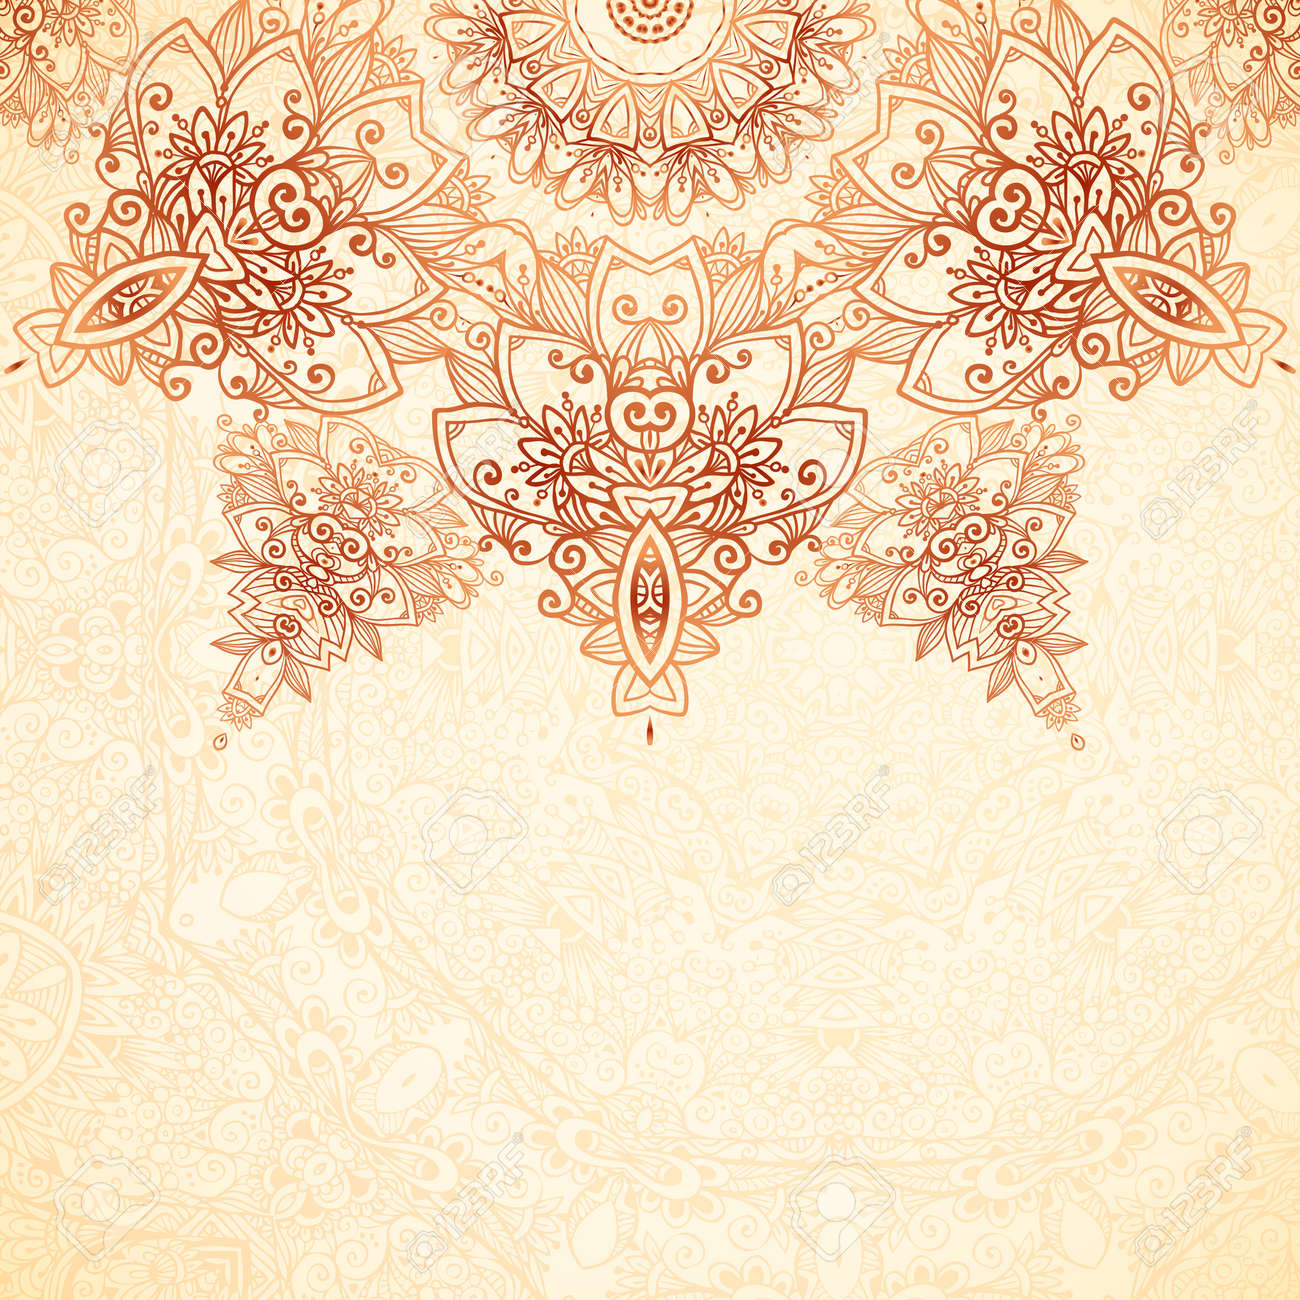 Ornate vintage vector background in mehndi style royalty free stock - Ornate Vintage Background In Mehndi Style Stock Vector 29751795